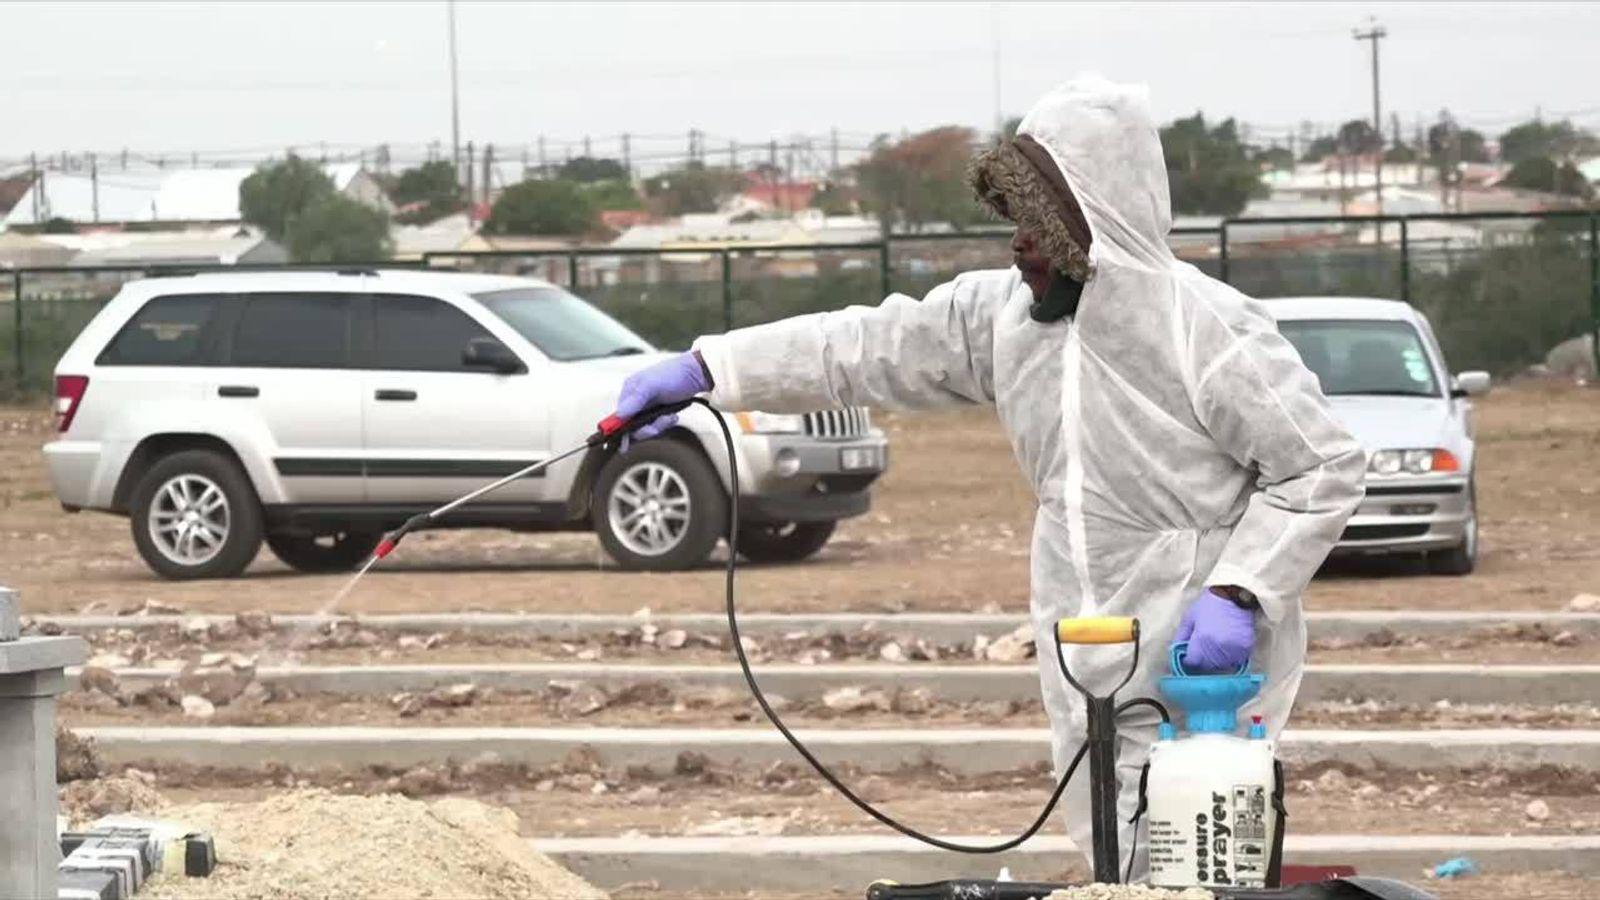 COVID-19: South Africa's health system 'buckling' | World News - Sky News